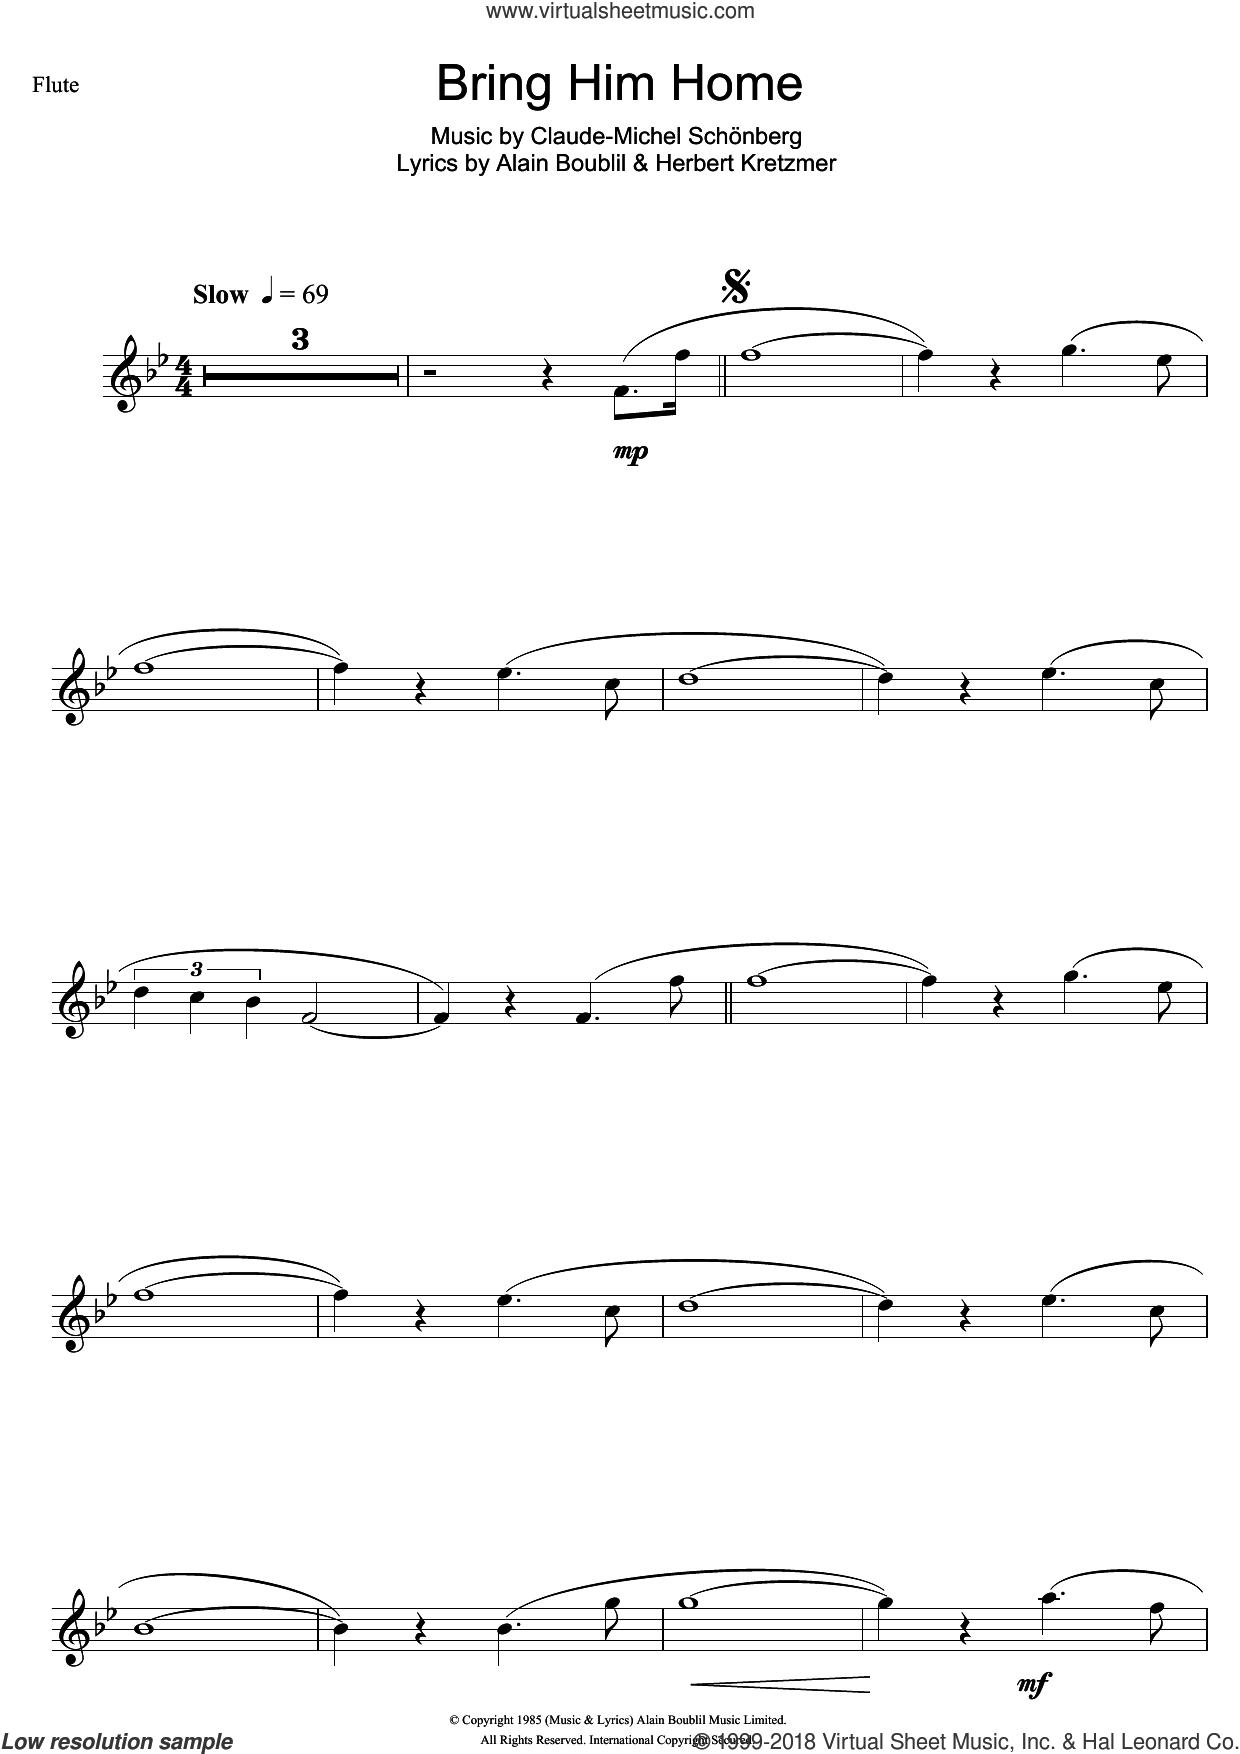 Bring Him Home (from Les Miserables) sheet music for flute solo by Claude-Michel Schonberg, Alain Boublil and Herbert Kretzmer, intermediate skill level